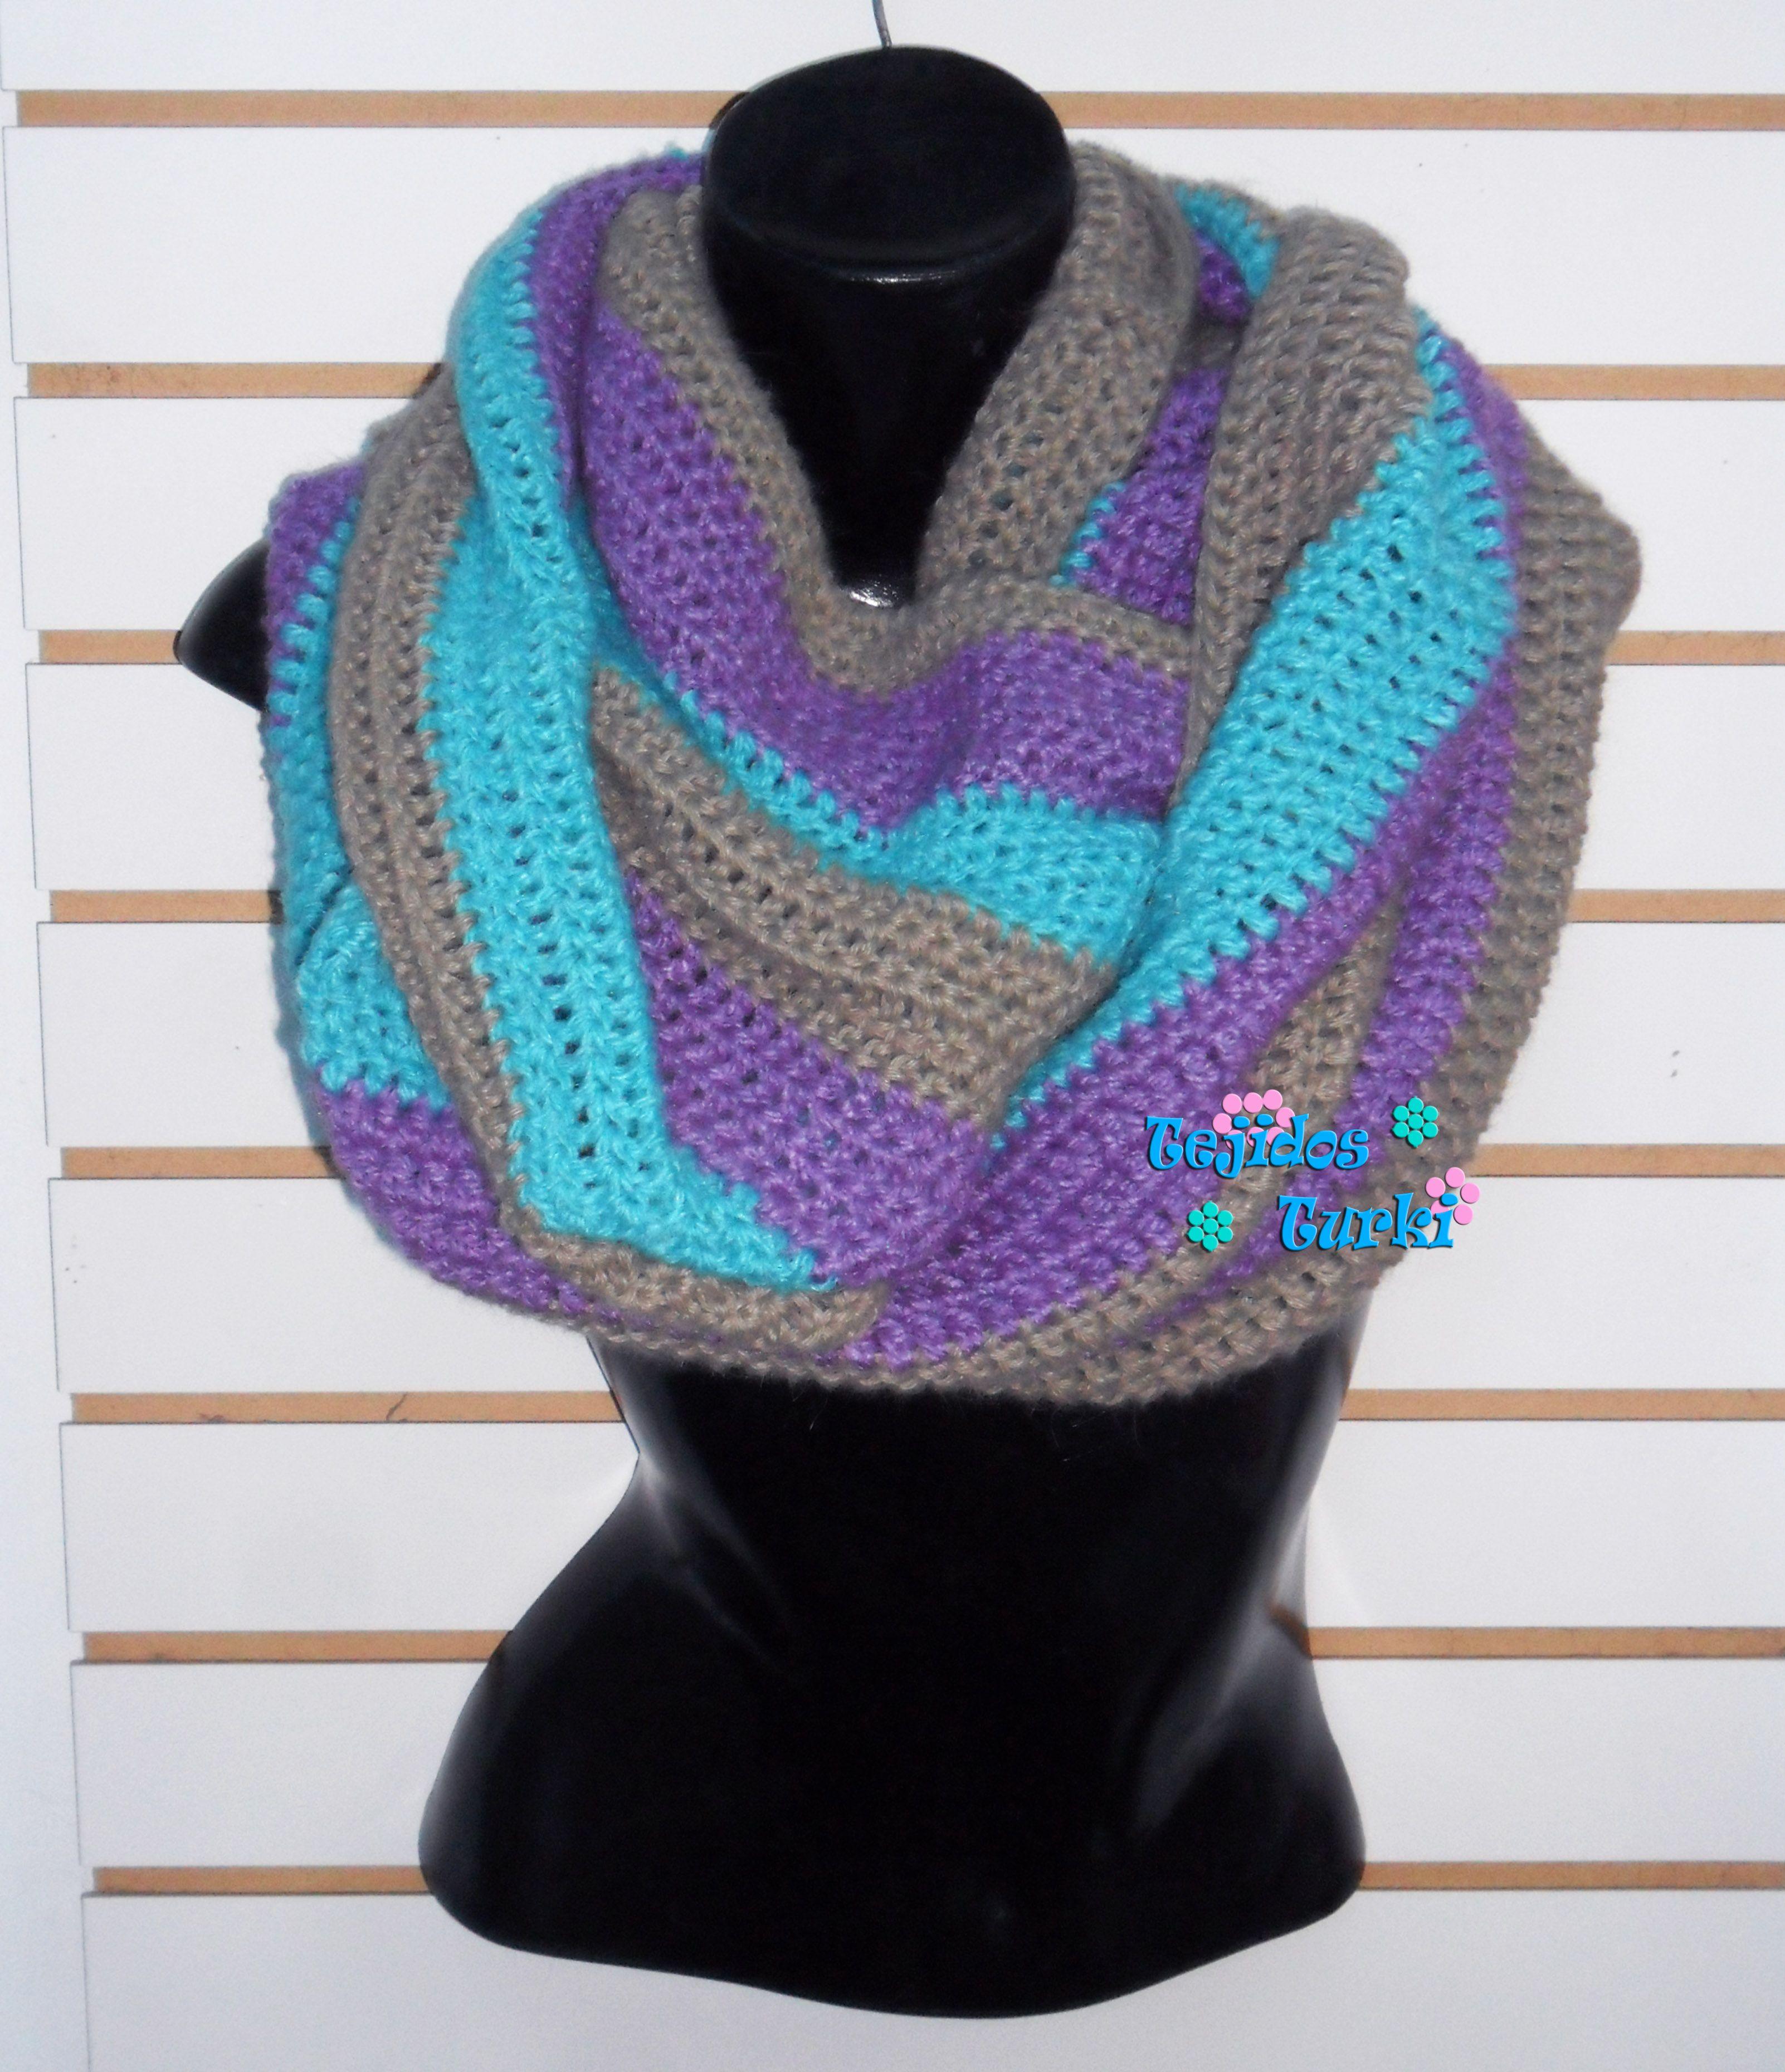 Bufanda circular tejida a crochet.